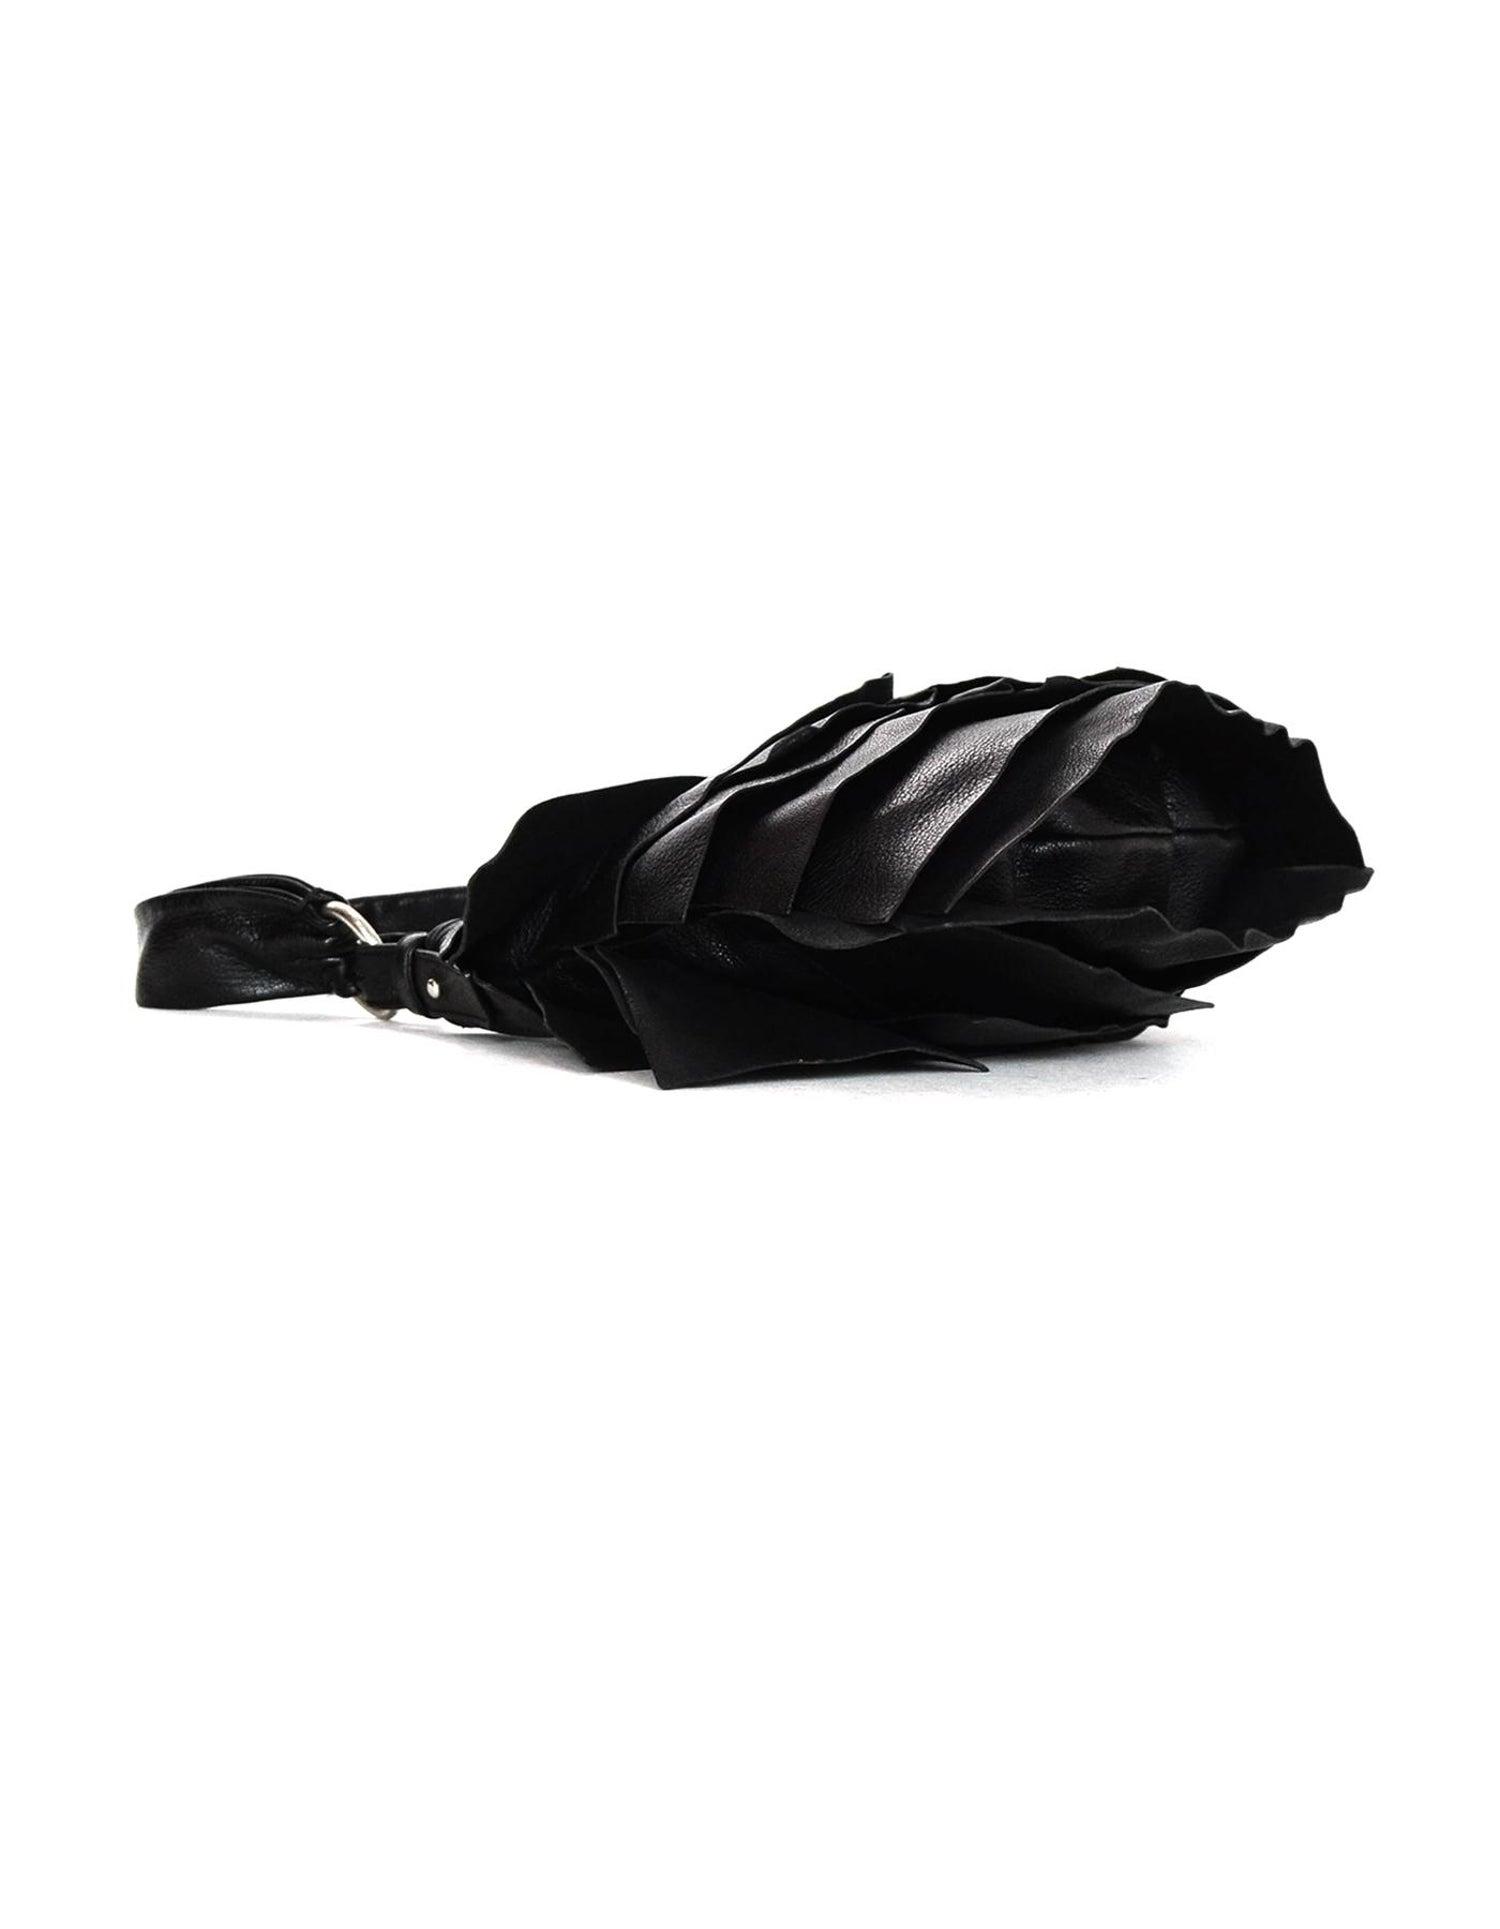 dbff79baf409 Yves Saint Laurent Ysl Leather Small St Tropez Ruffle Bag Black